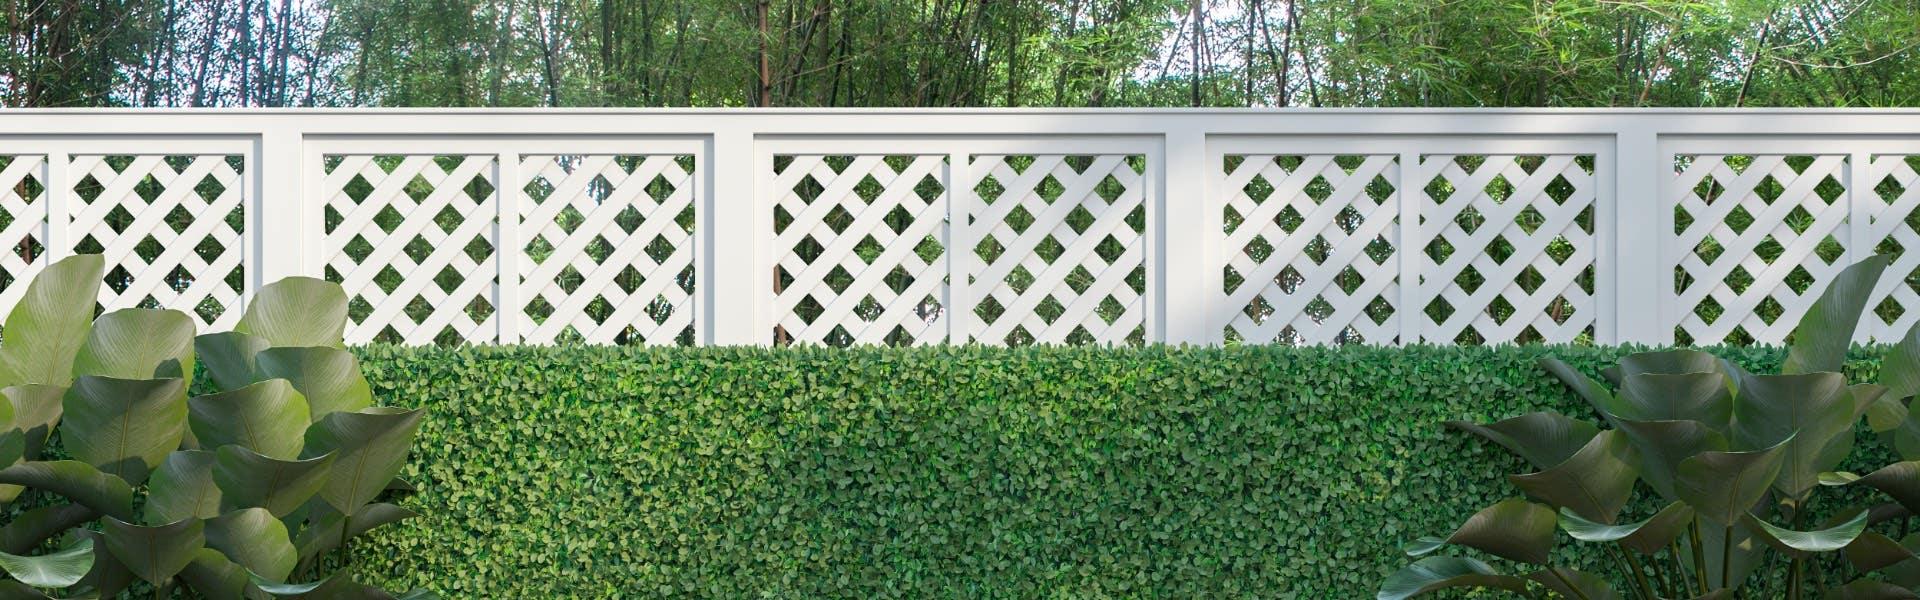 backyard garden with lattice fence